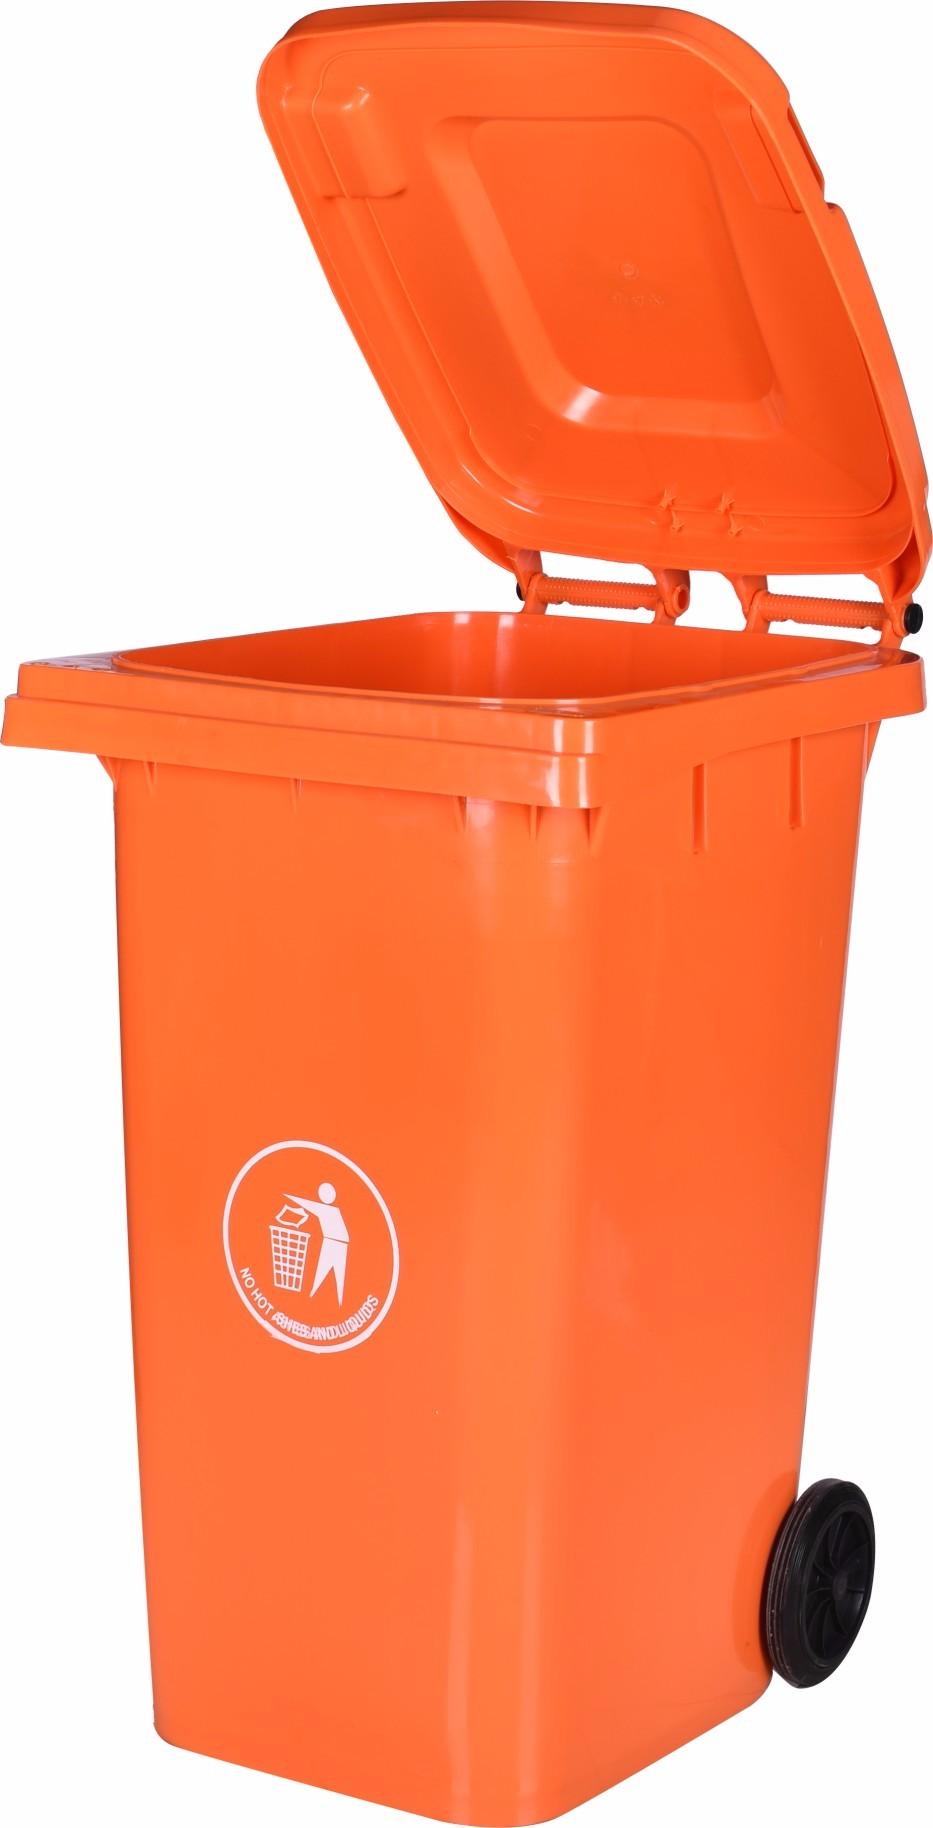 Light 240l Storage Bins Plastic Color Codes For Waste Bins